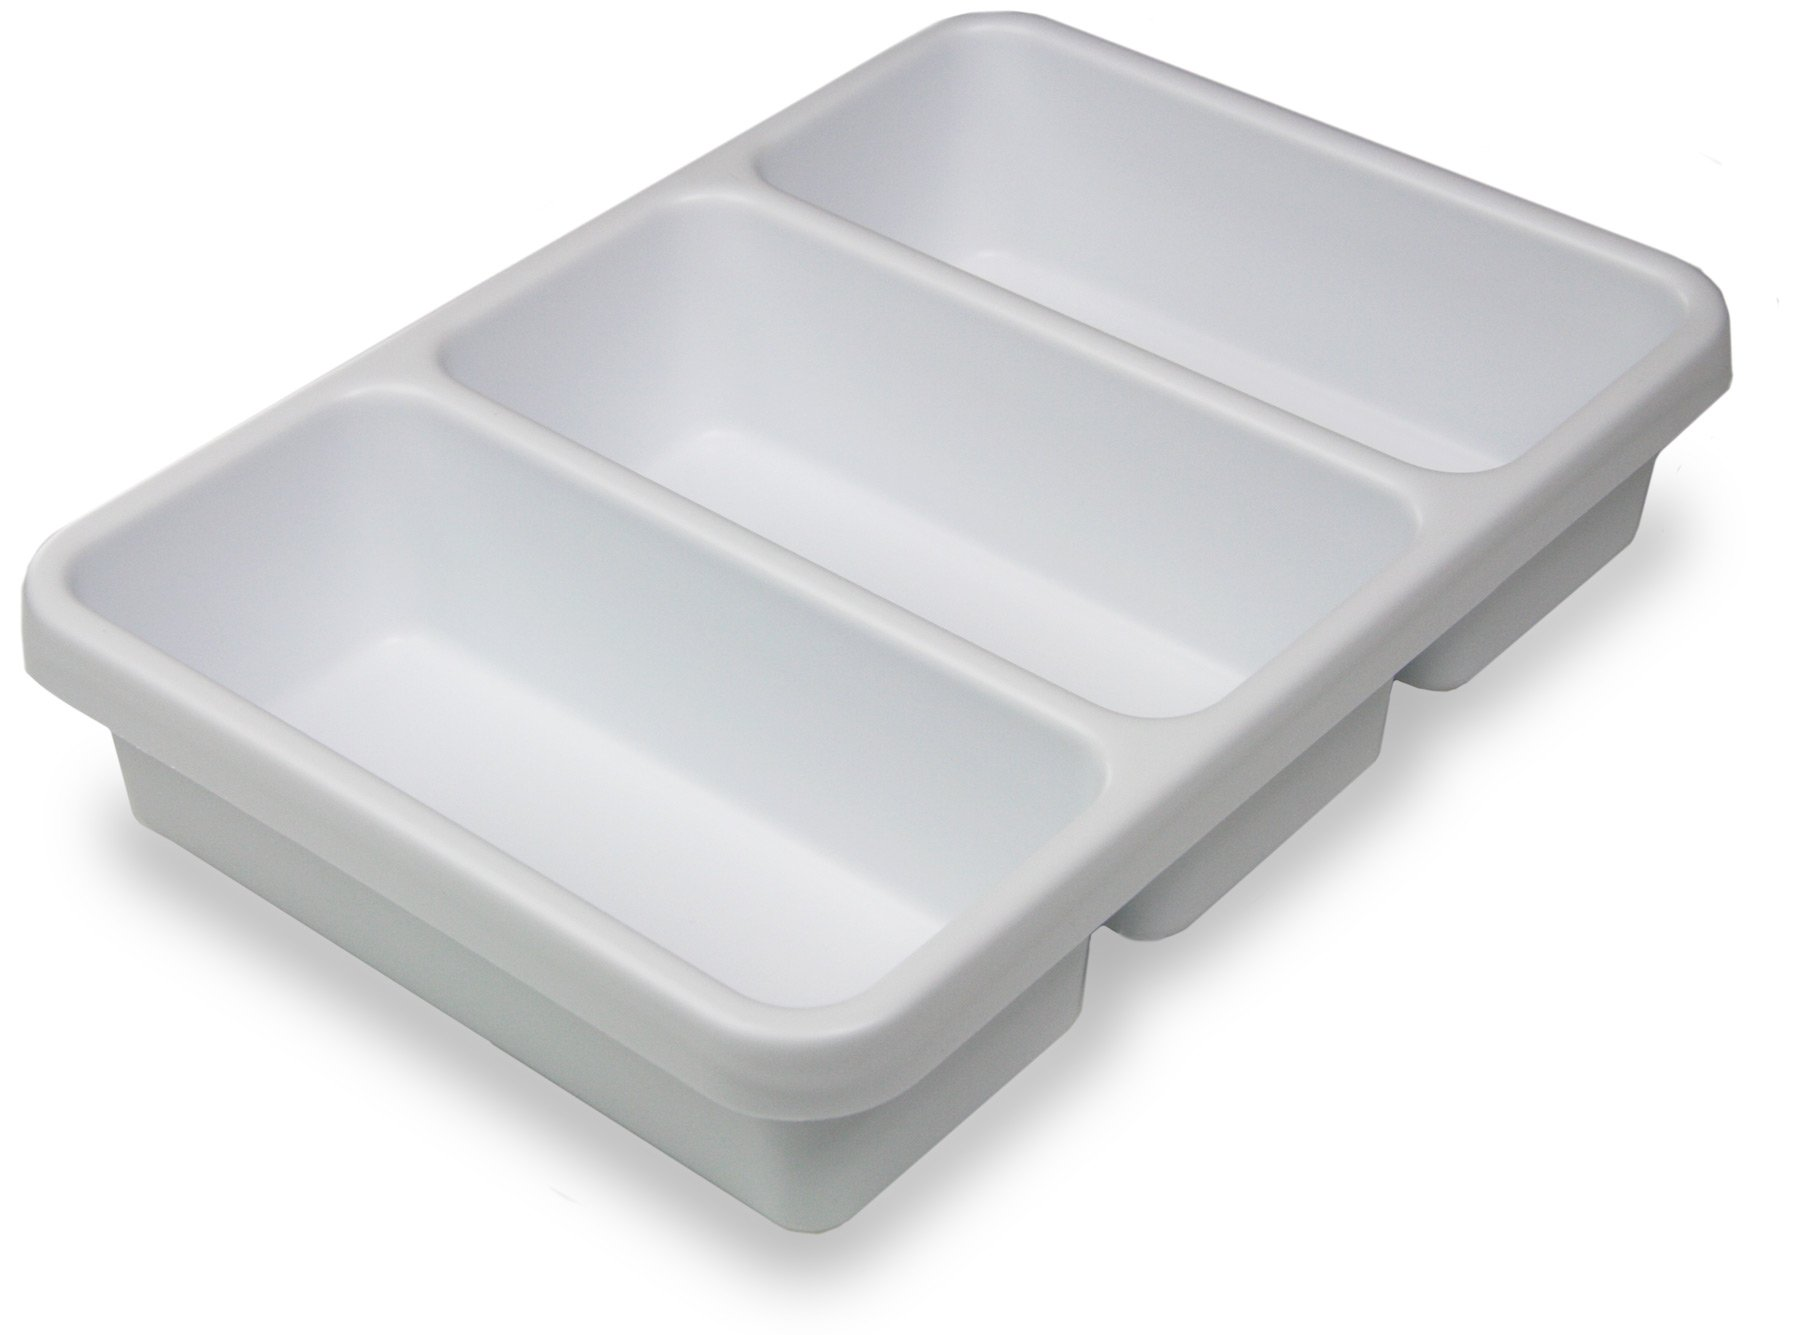 "TrippNT 50399 White Polystyrene Plastic Drawer Organizer, 3 Pocket: 14"" Width x 3"" Height x 10"" Depth"